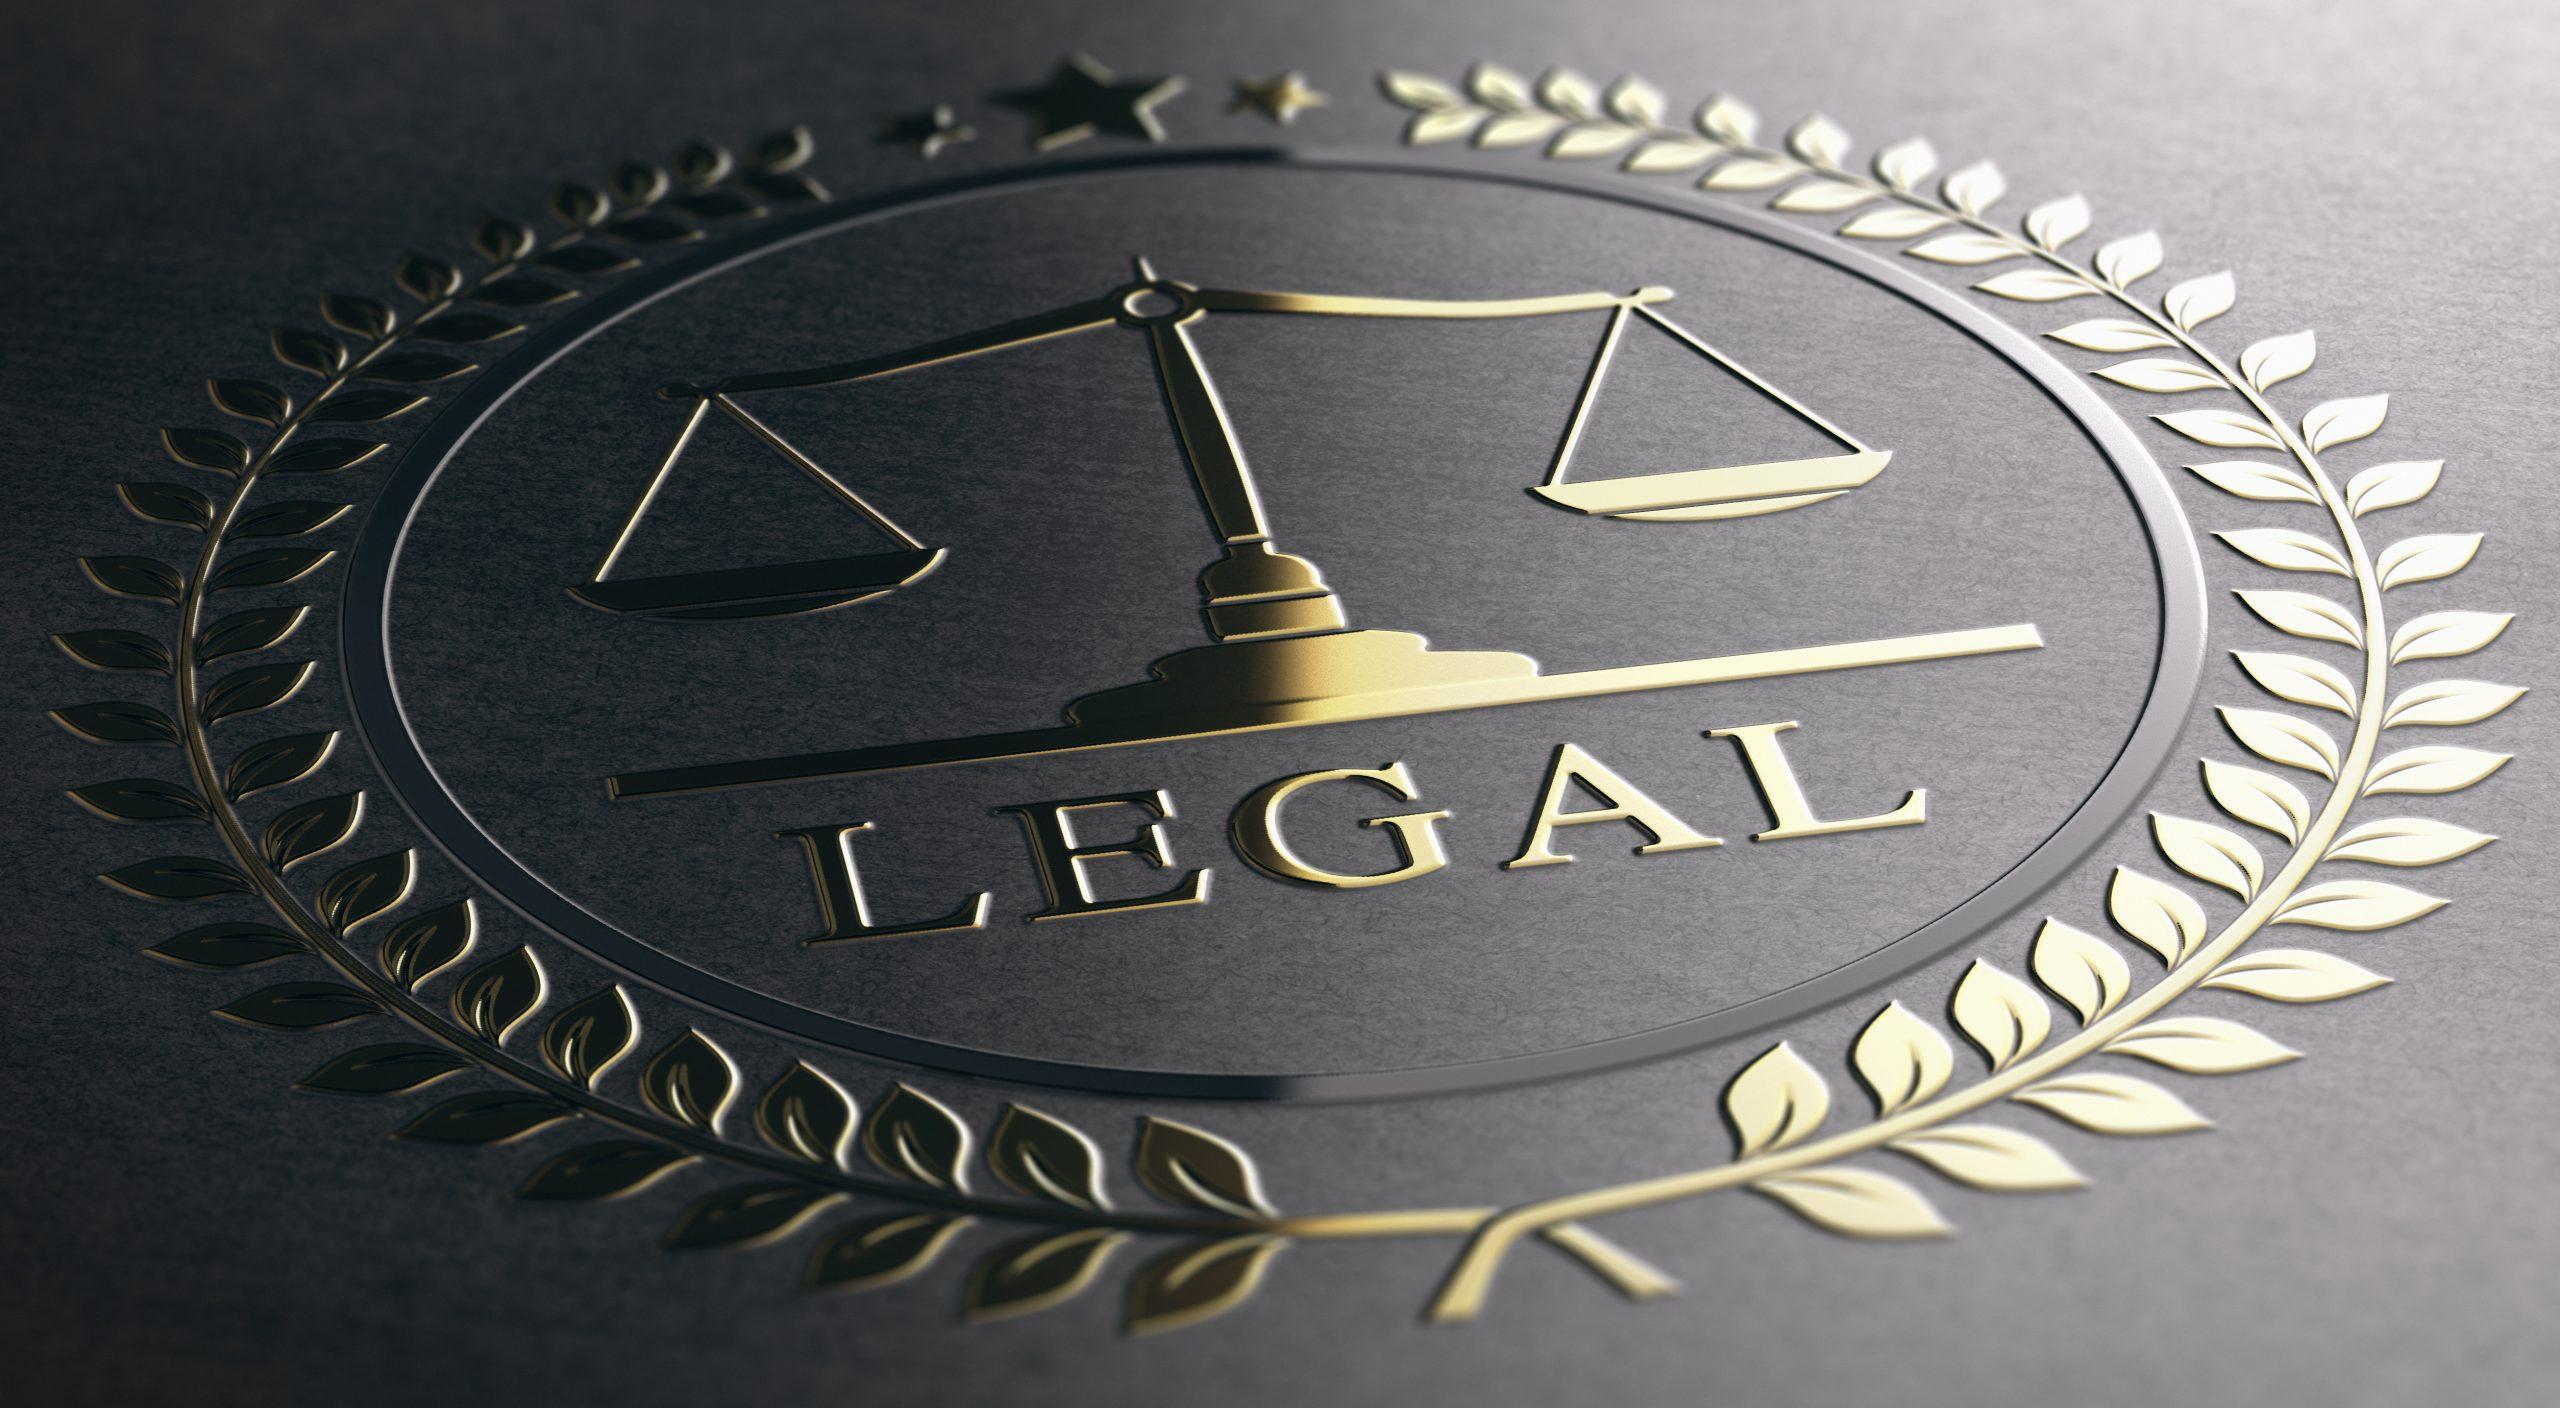 Das MAXPOOL-Rechtsberatungspaket